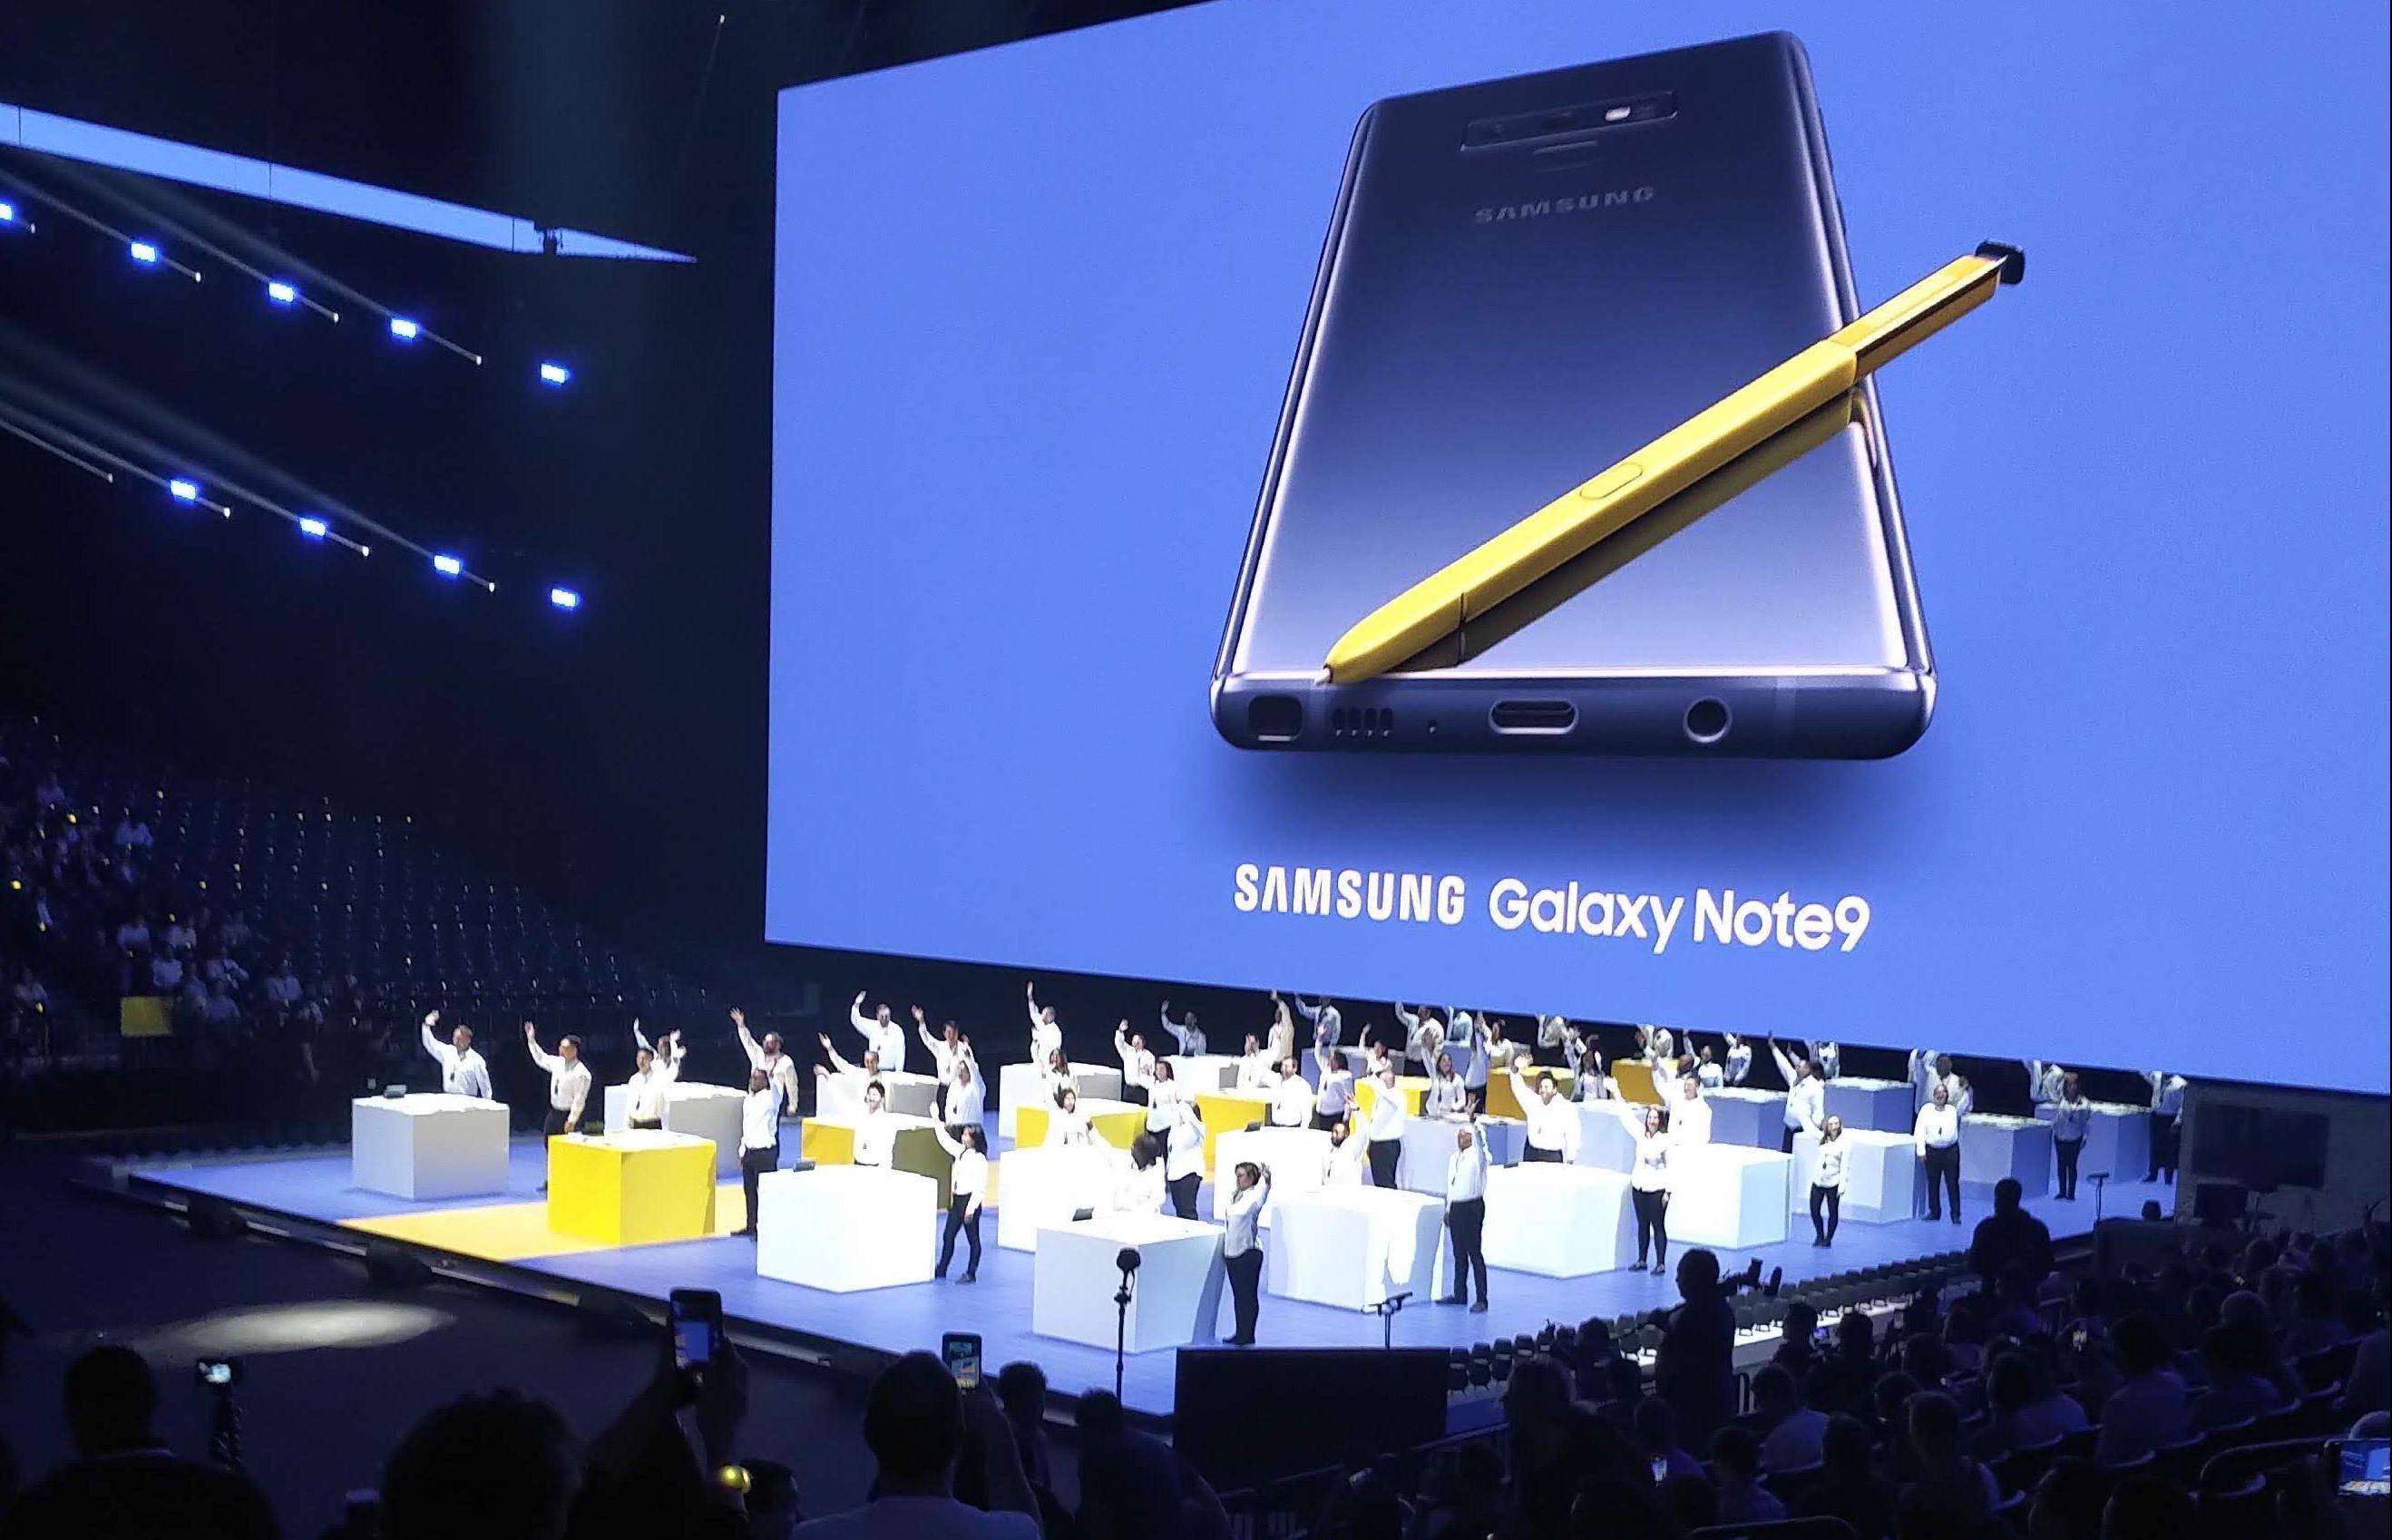 Samsung Unpacked - Galaxy Note 9